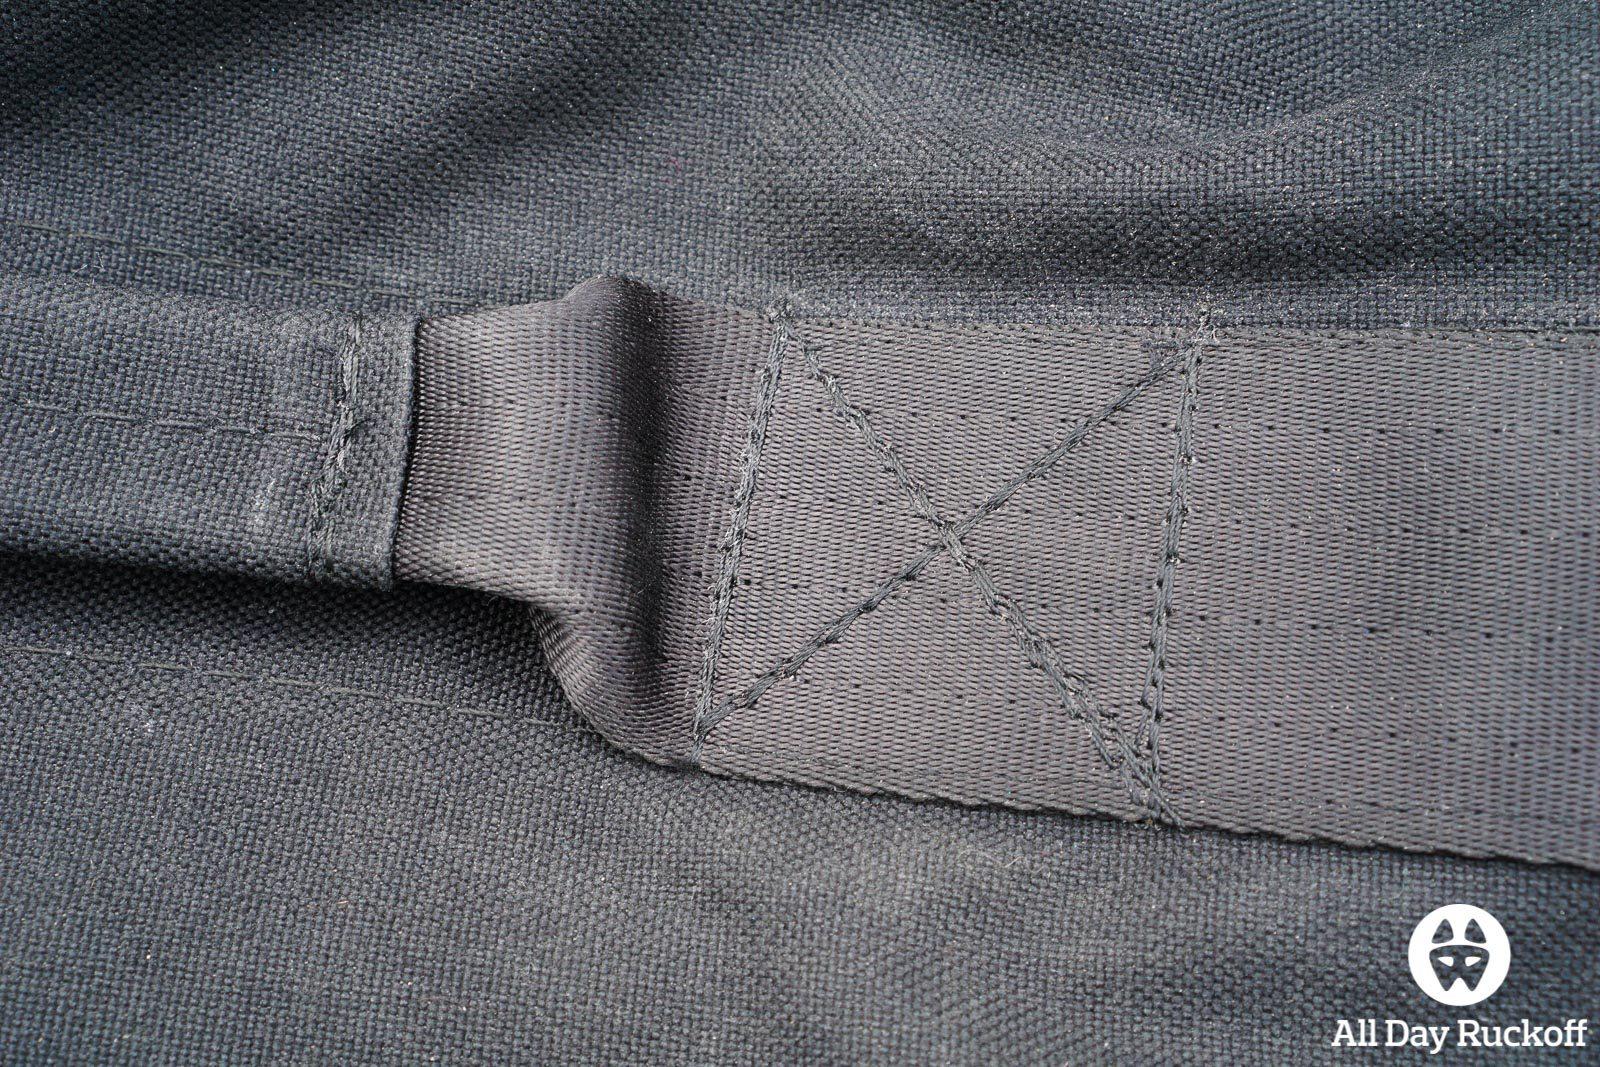 Brute Force Athlete Sandbag - Handle Sewing